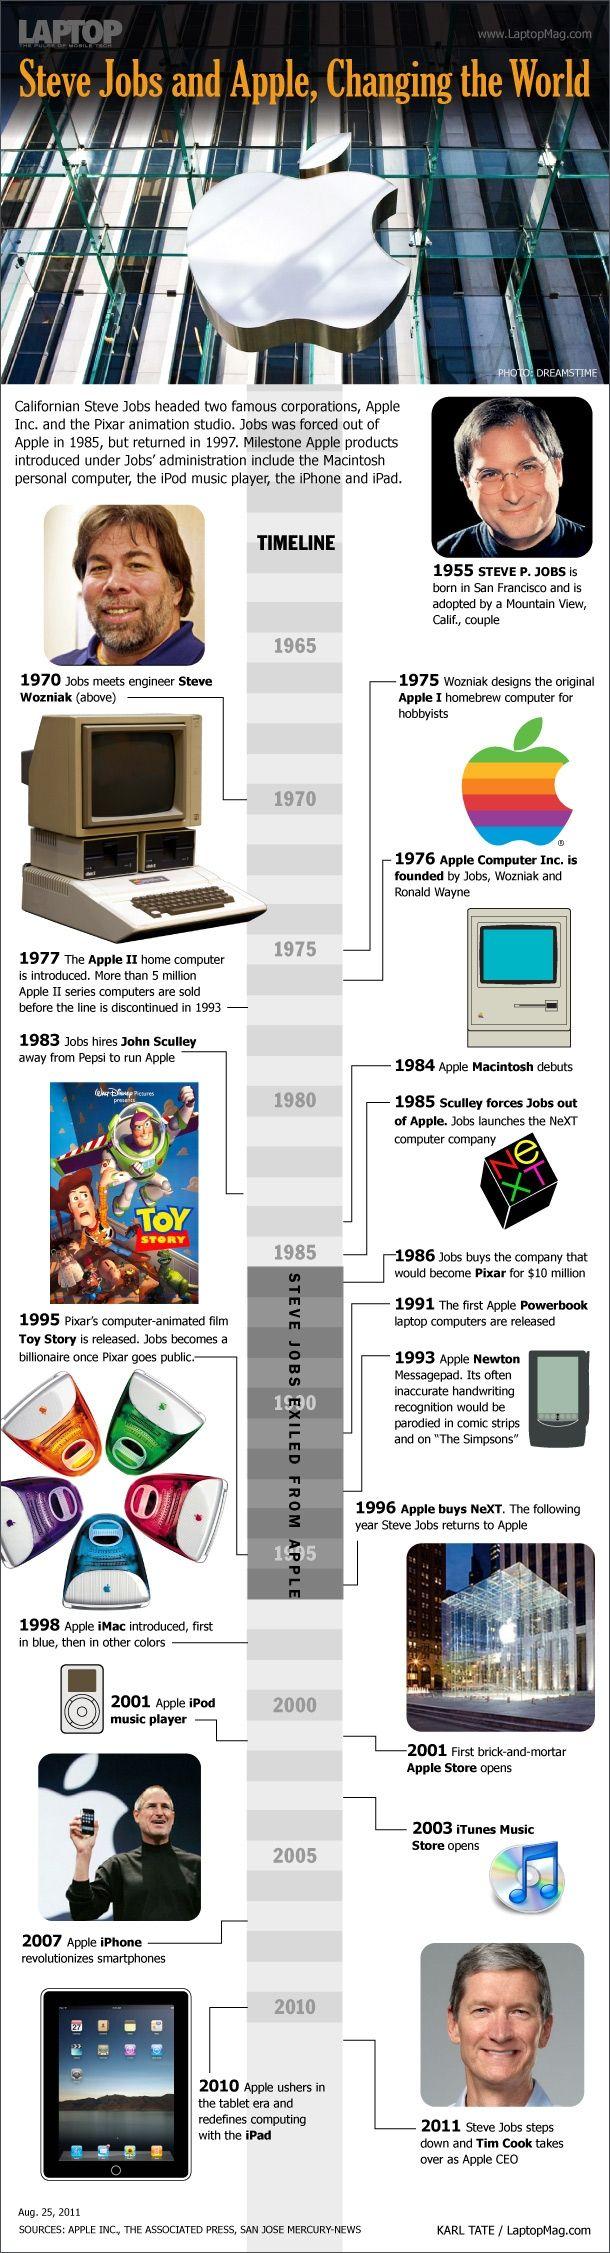 Timeline de Apple y Steve Jobs #infografia #infographic